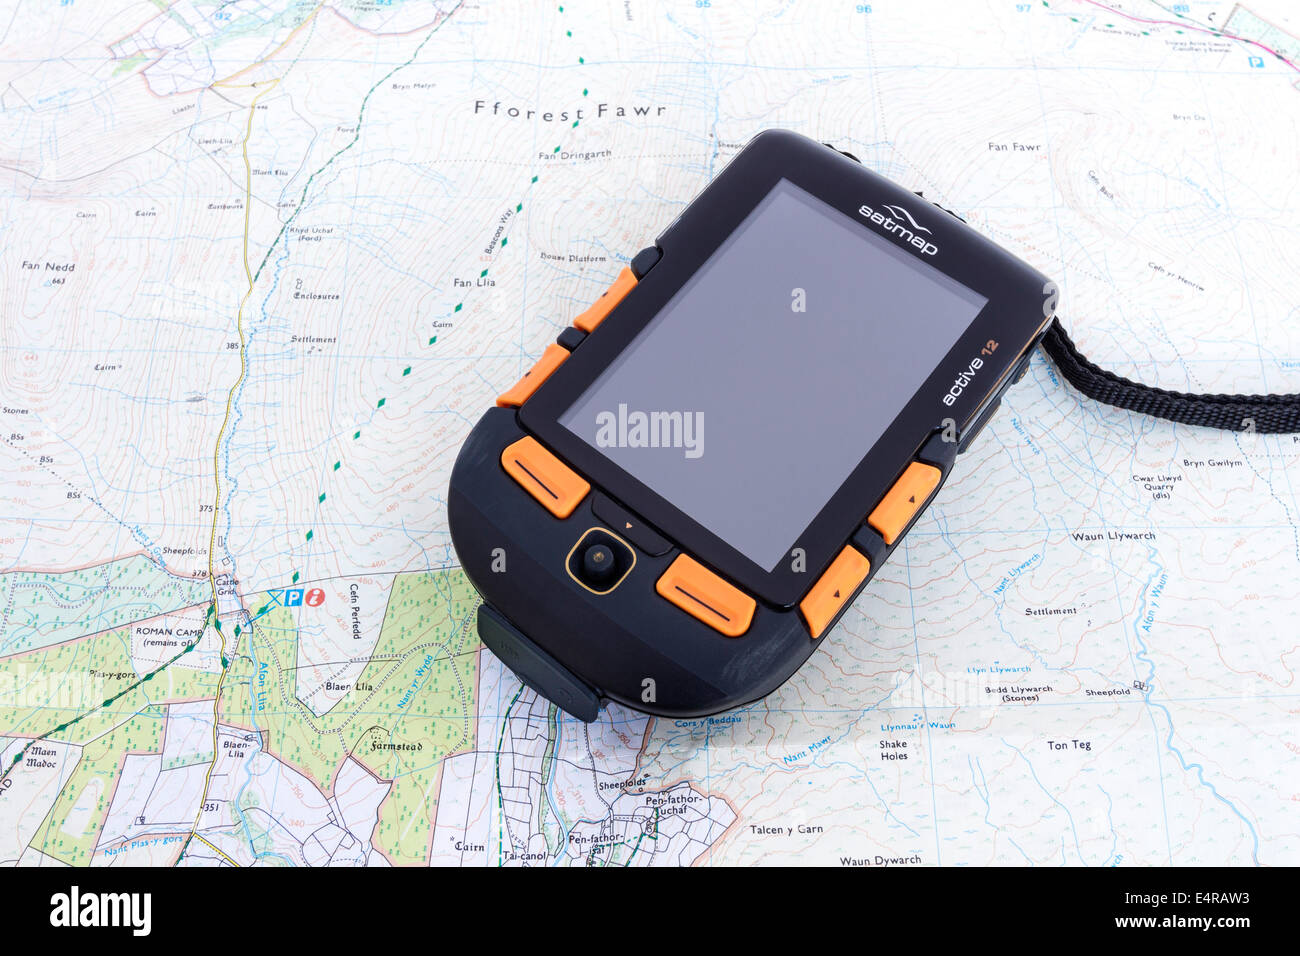 Satmap Active 12 GPS Unit and Ordnance Survey Map Stock Photo